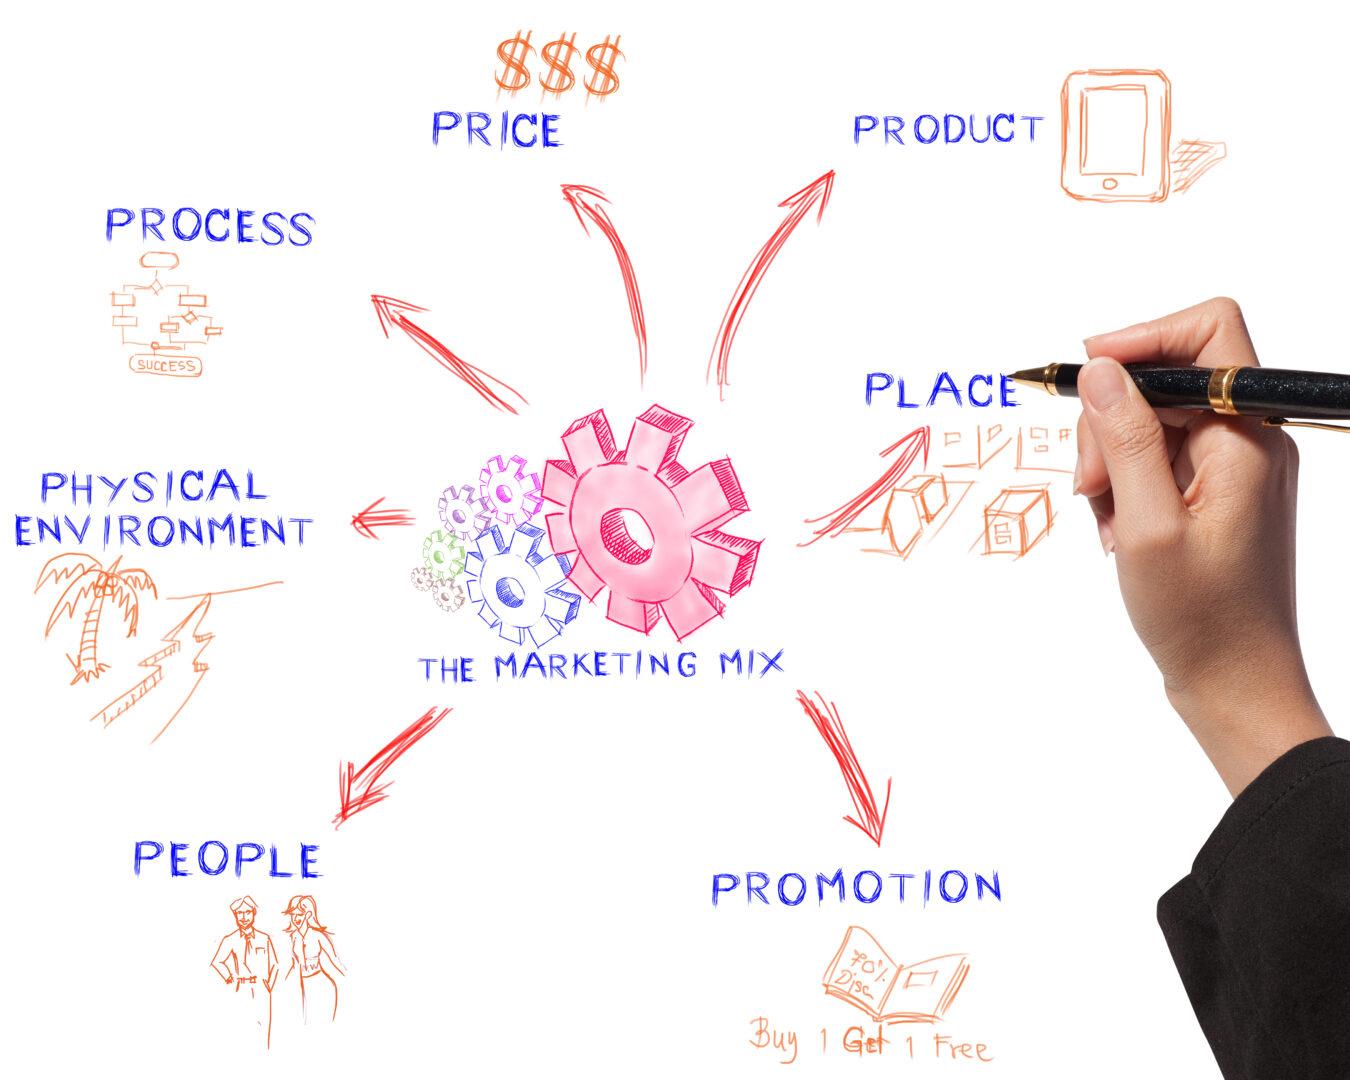 marketing mix 7Ps